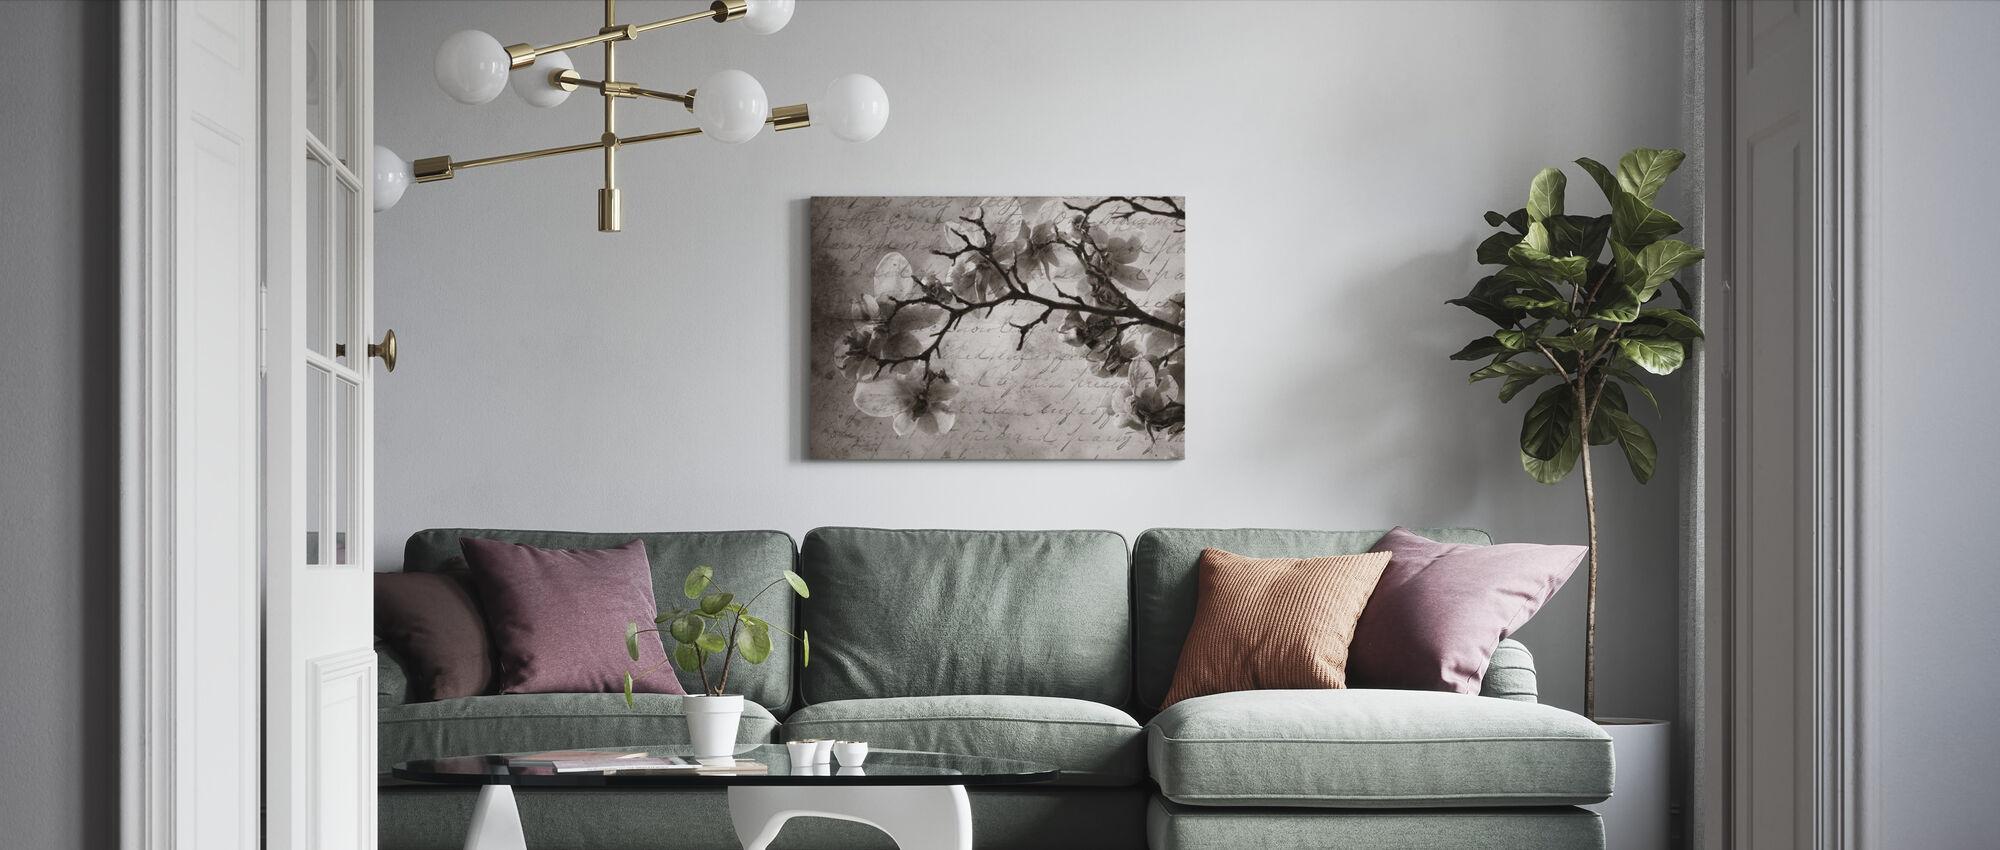 Magnolia Herinneringen - Canvas print - Woonkamer